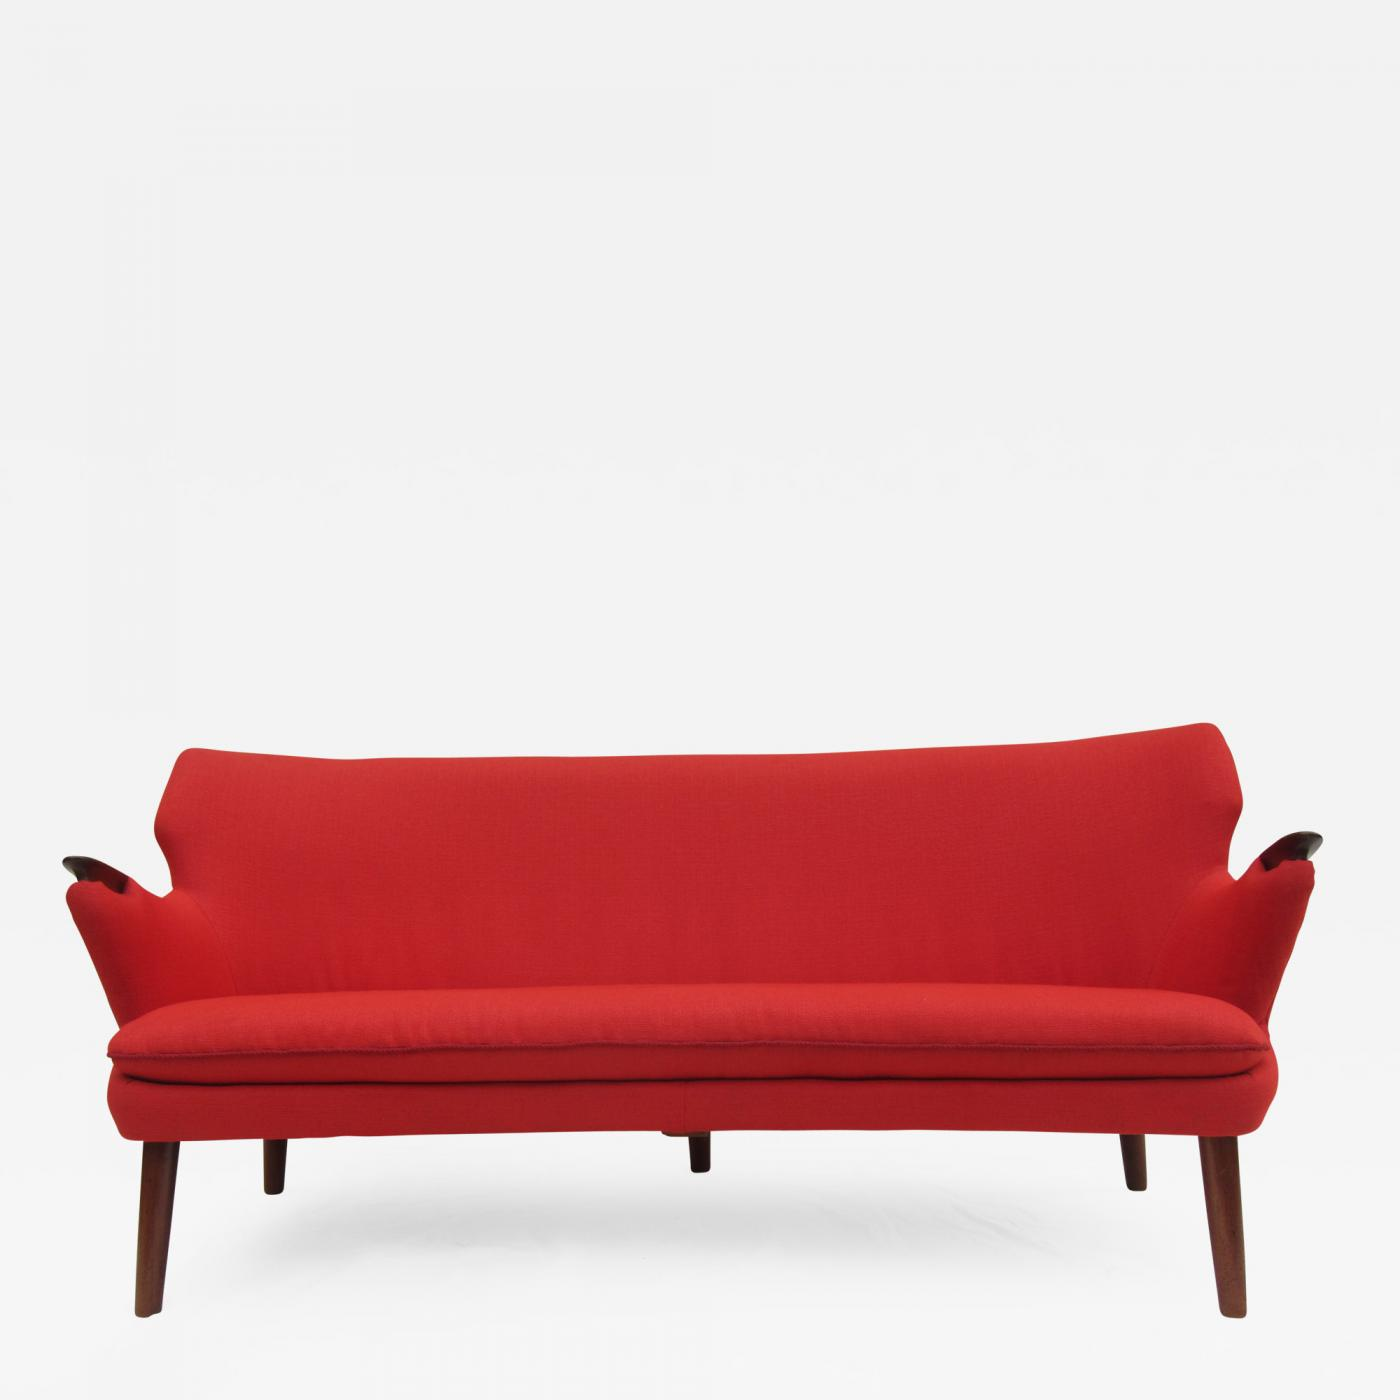 Kurt Olsen Kurt Olsen Danish Modern Sofa